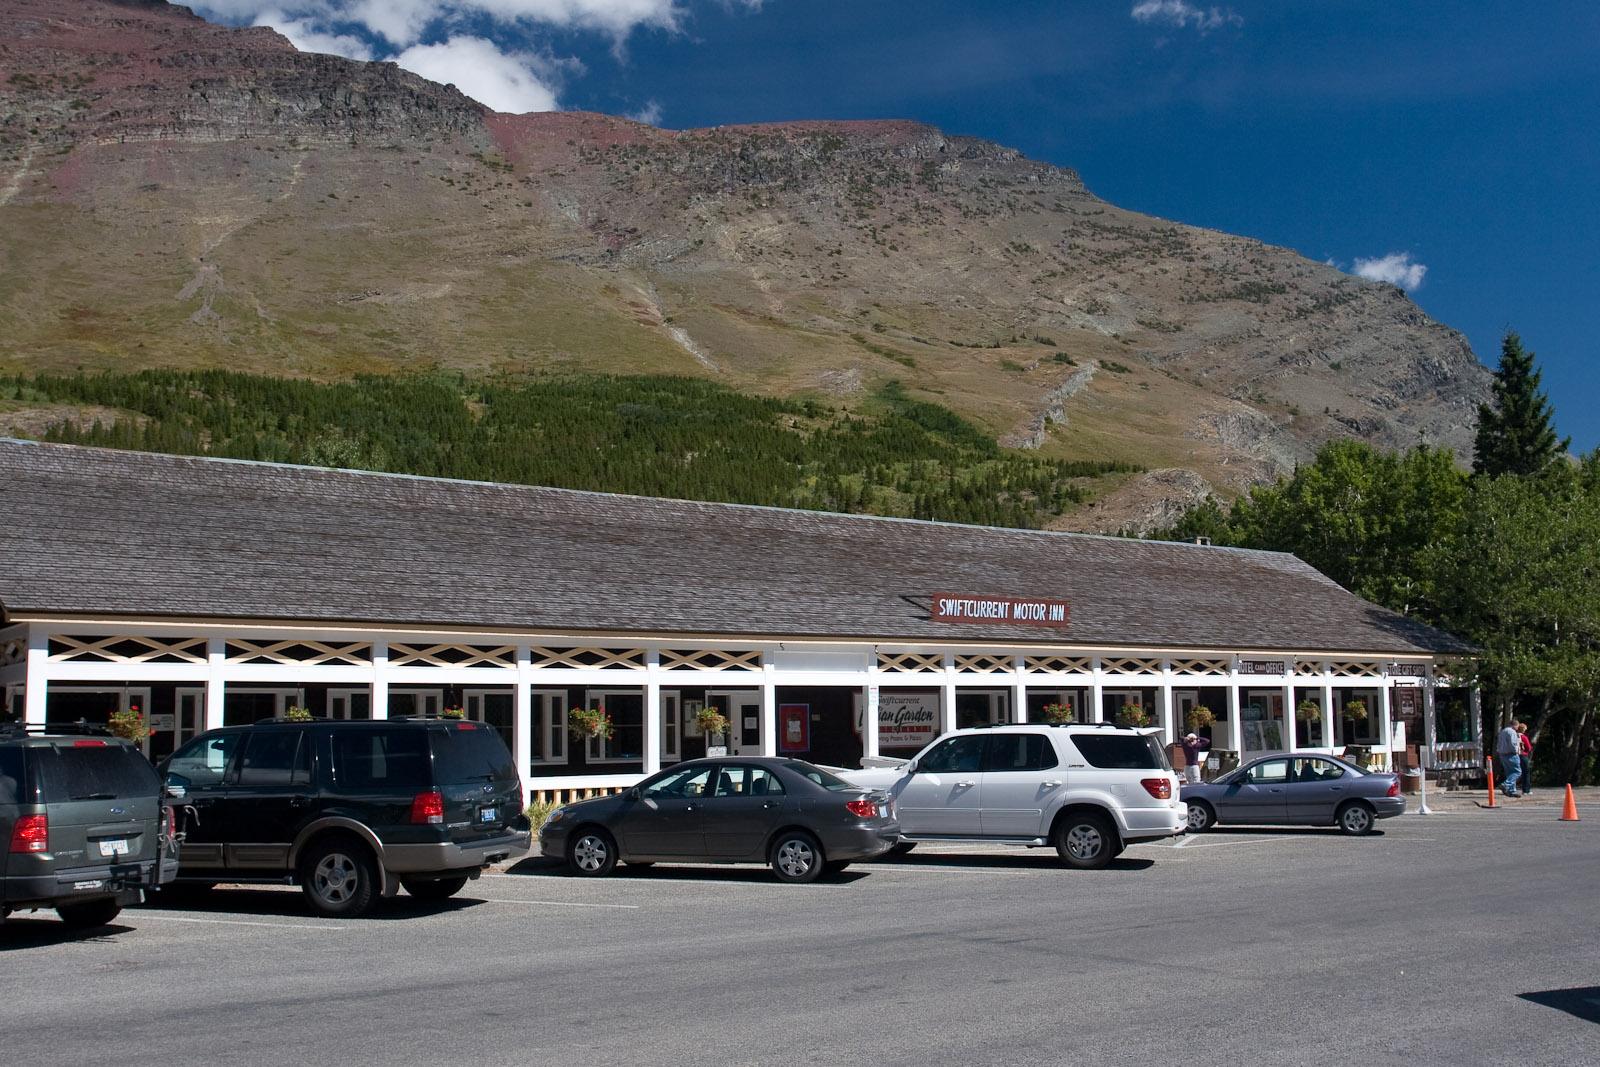 File Swiftcurrent Motor Inn 4172583402 Jpg Wikimedia Commons